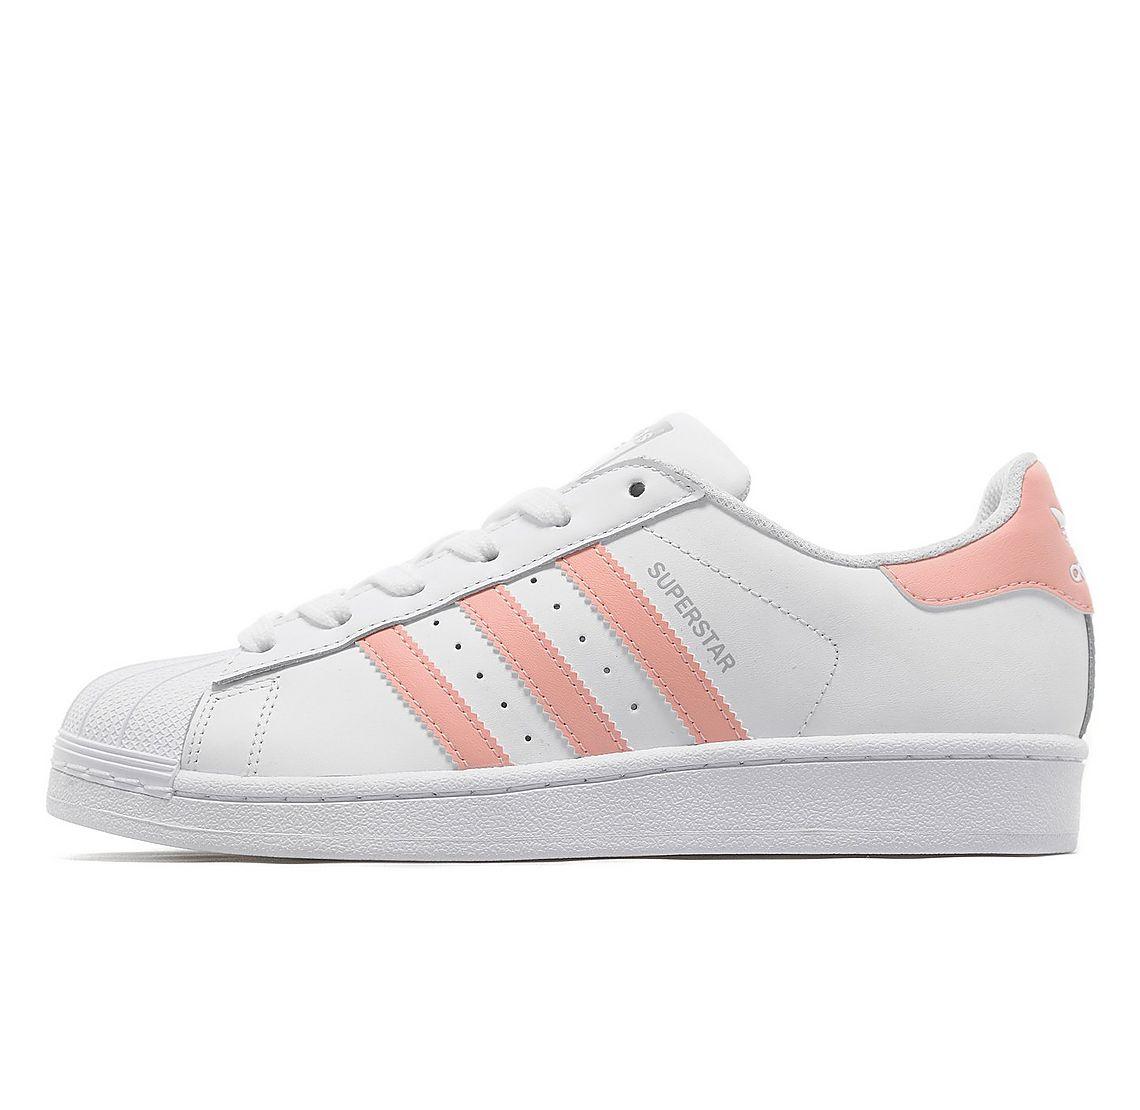 46dd339fc19a3 Streifen Rosa Streifen Superstar Rosa Adidas Adidas Superstar qMVLpjGUSz